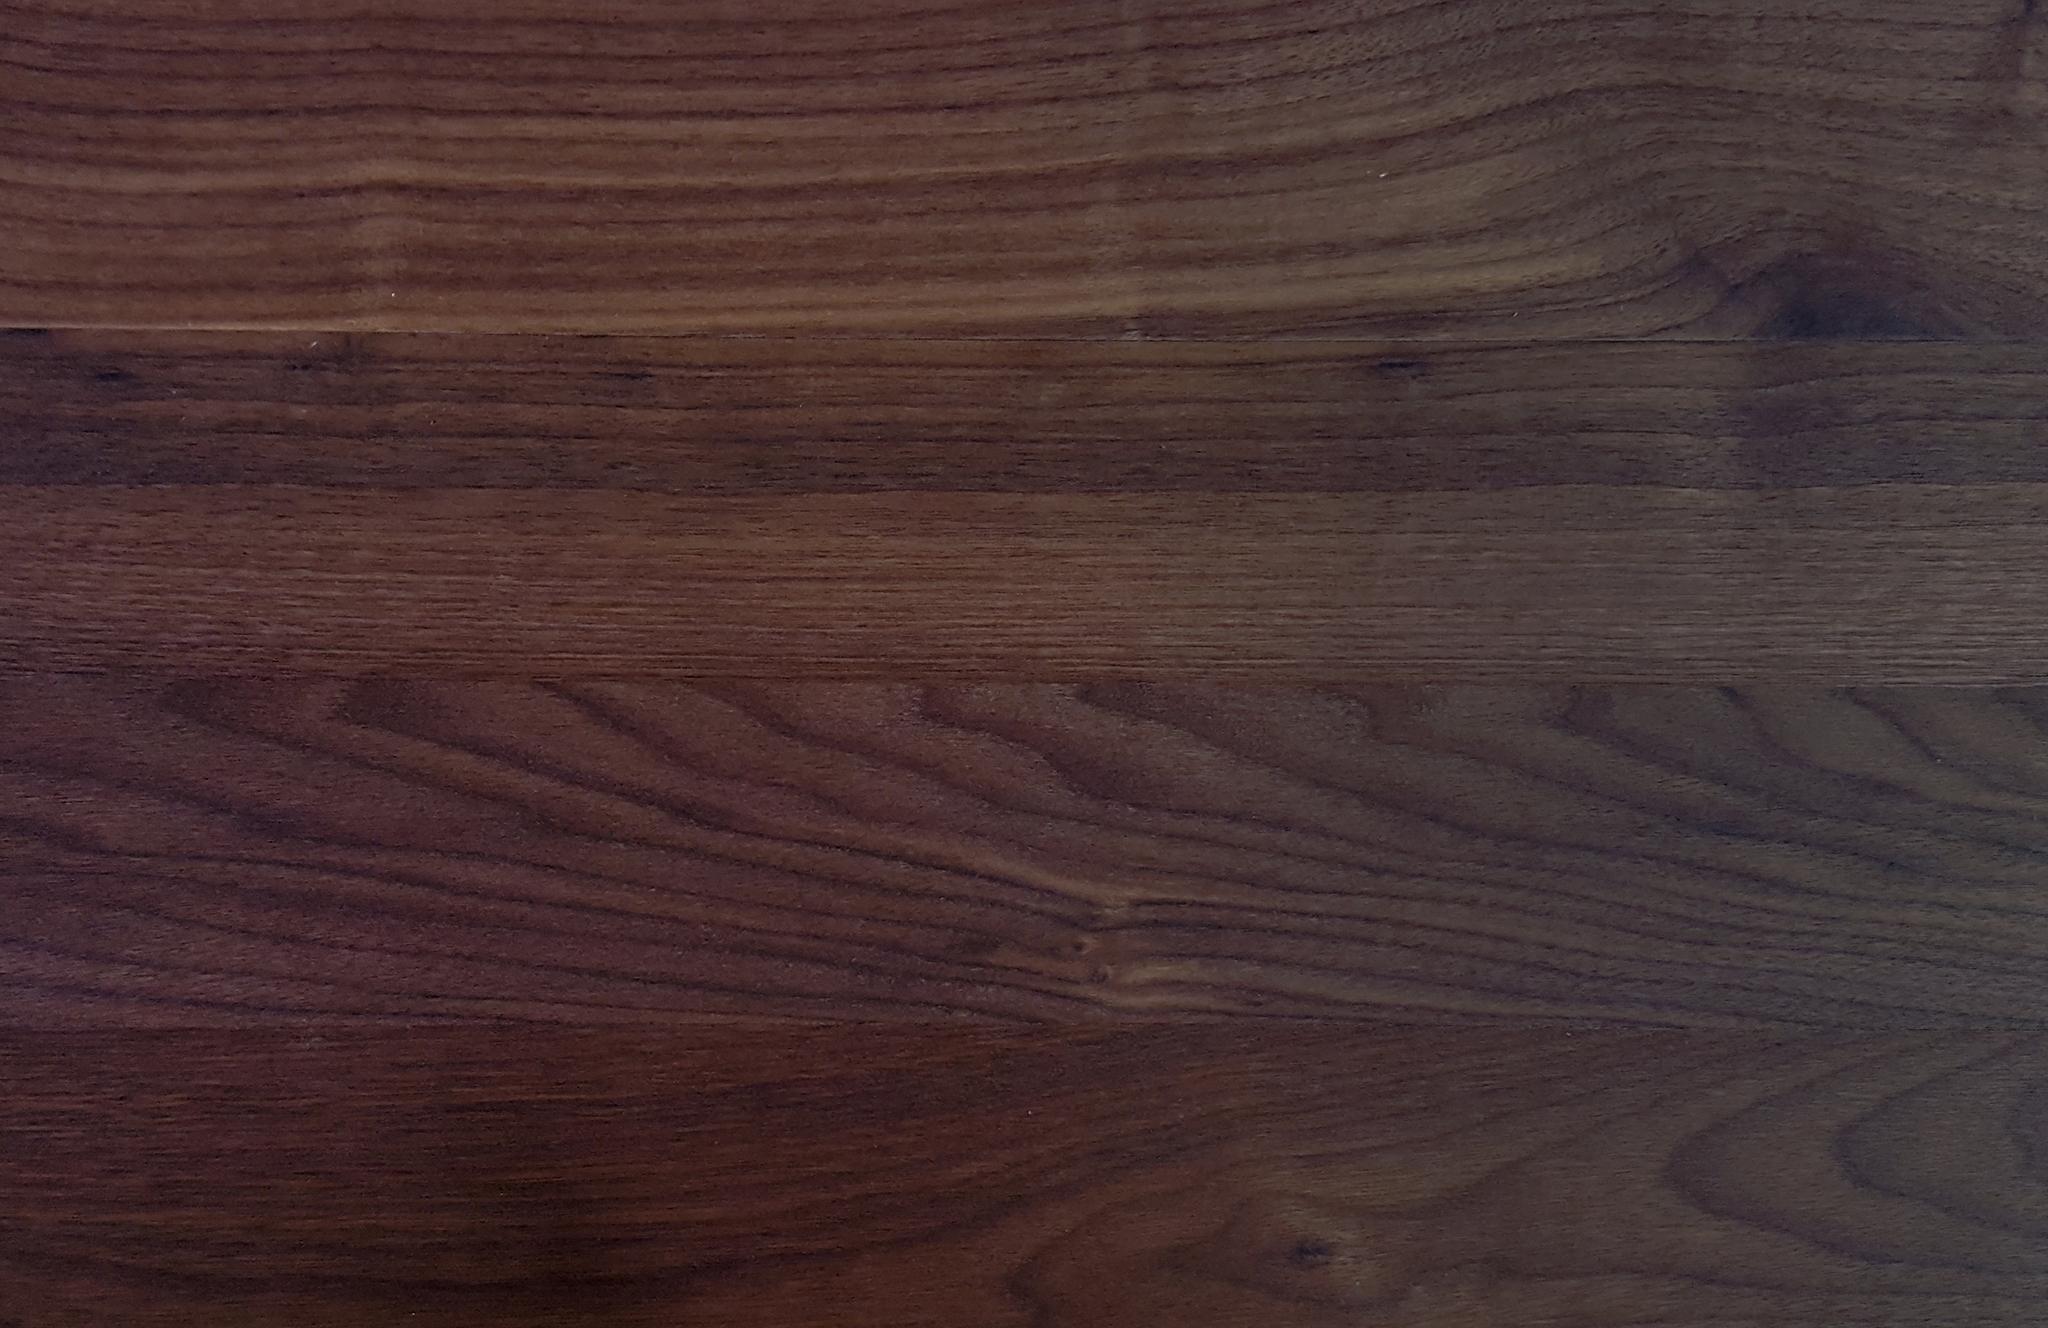 PARAT 22 ami. walnut select t/g 22mm